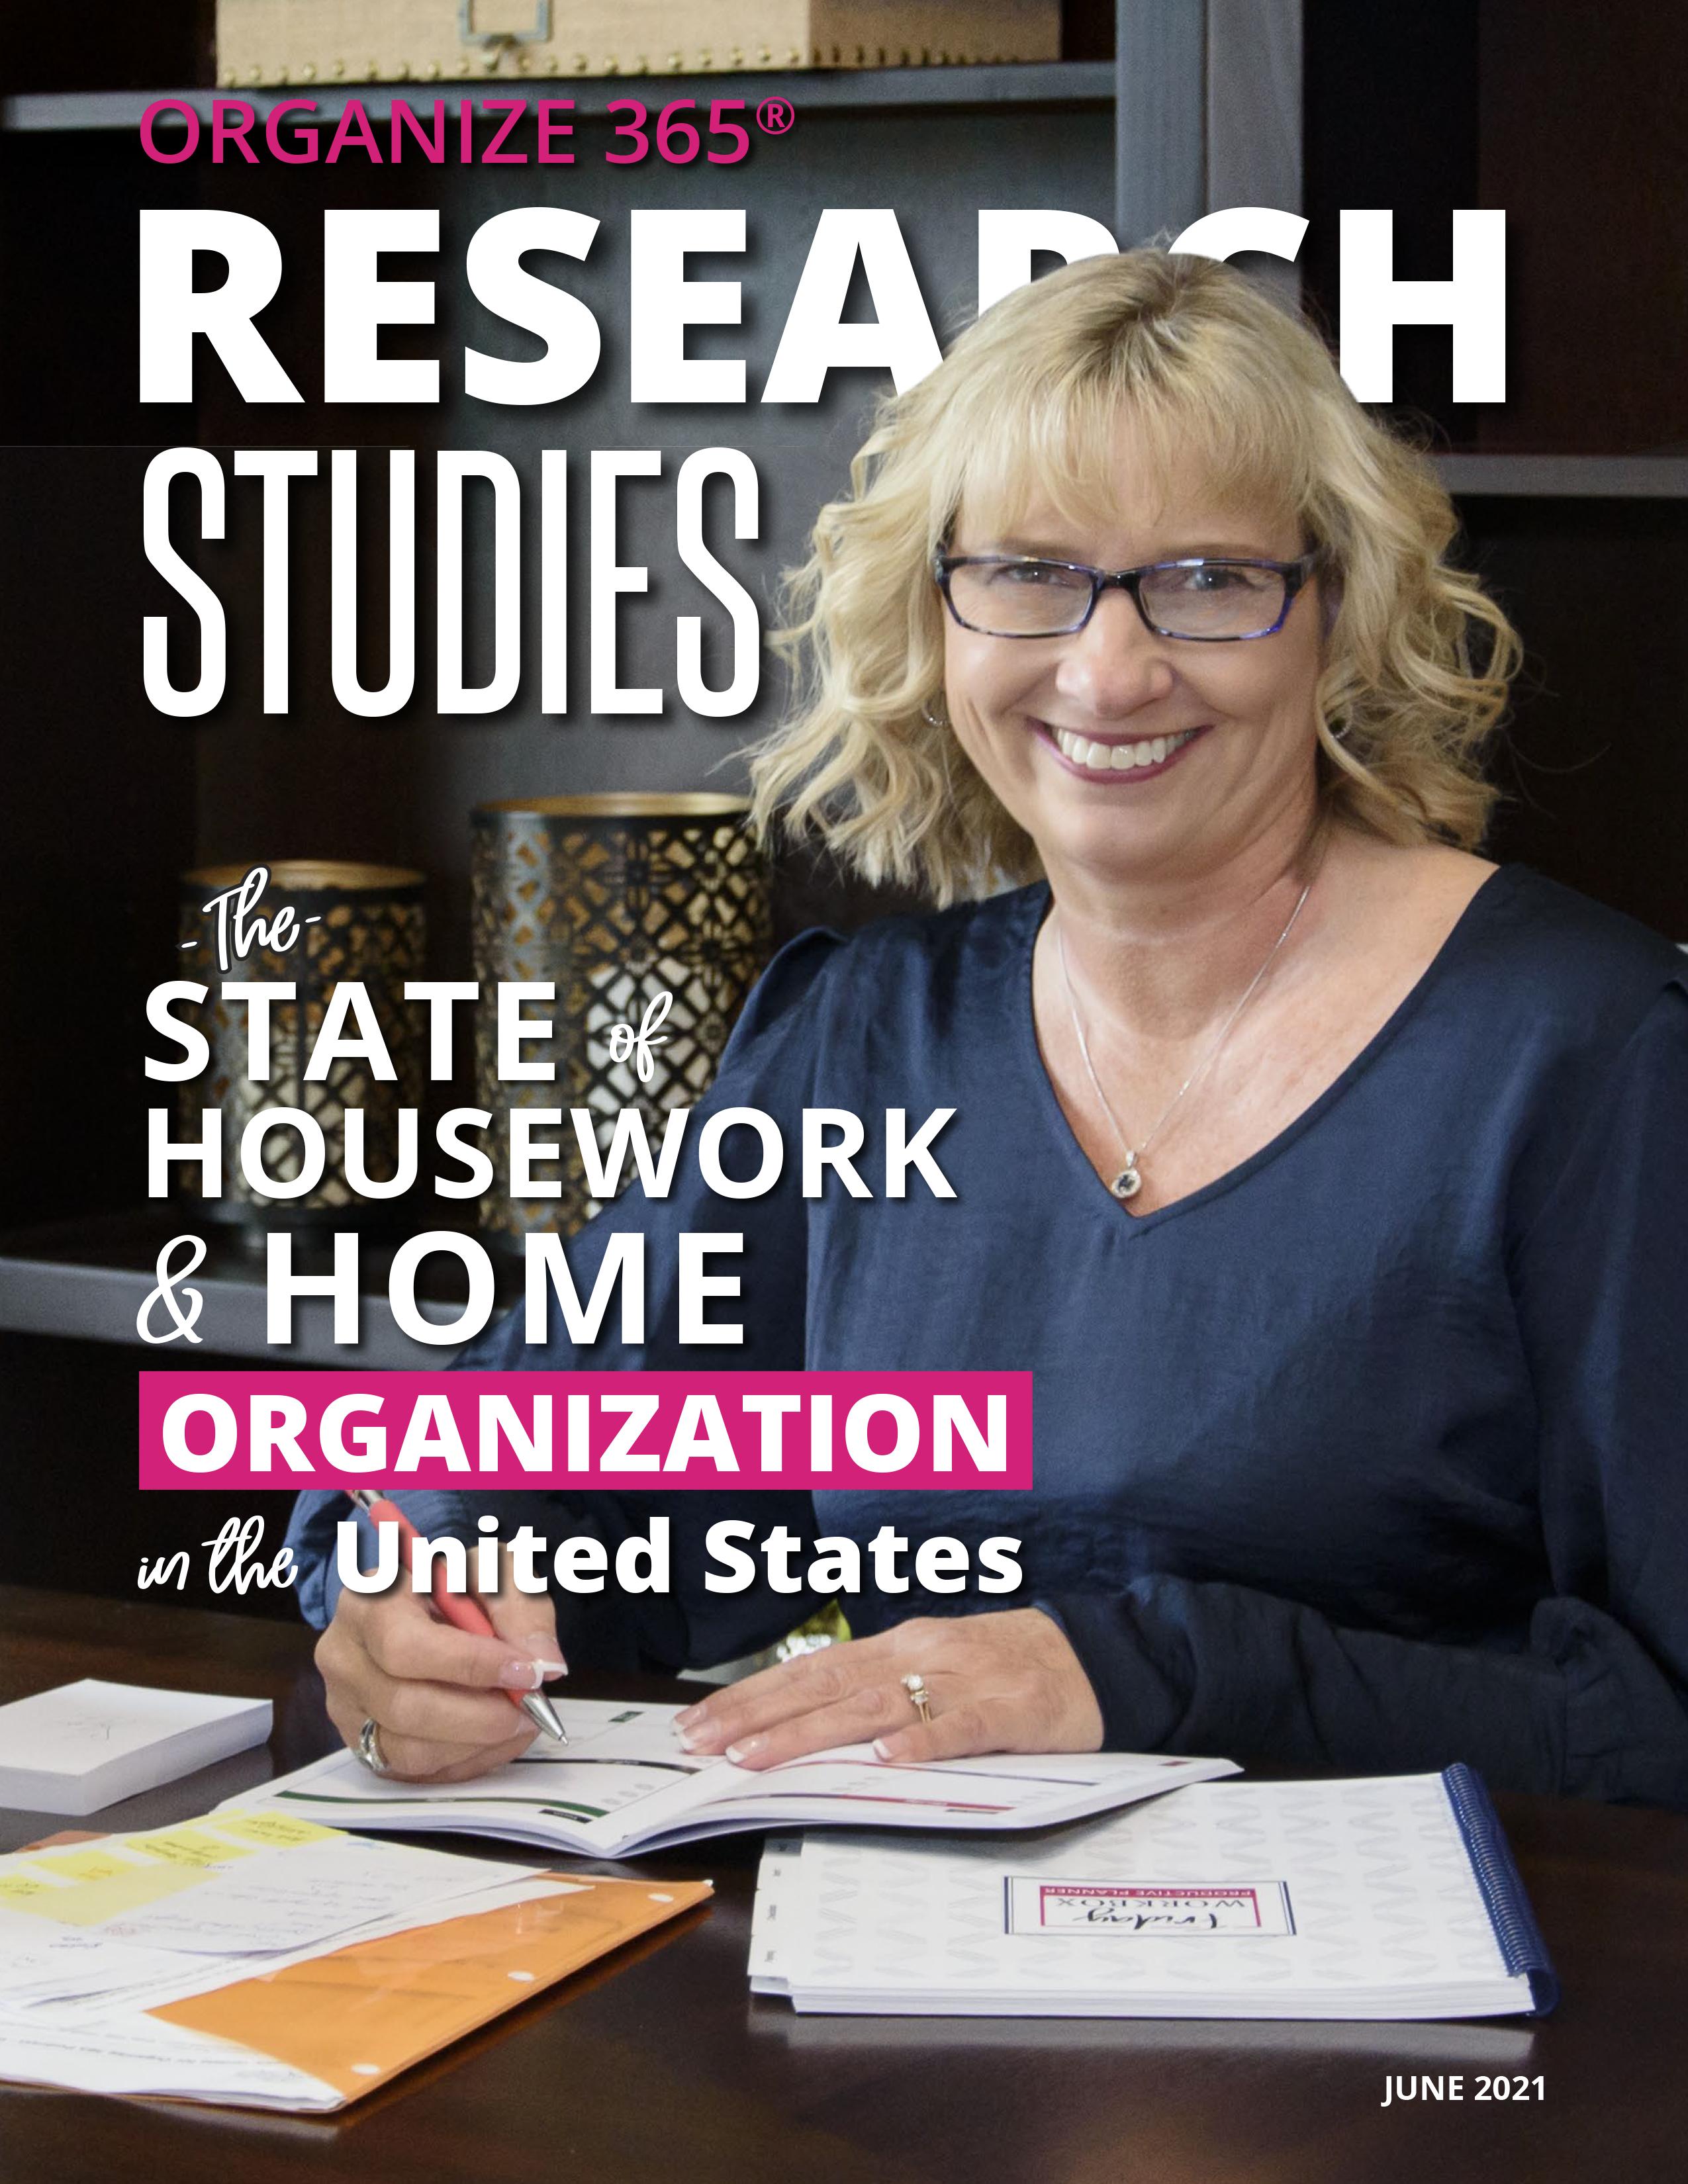 Organize 365 Research Studies Magazine